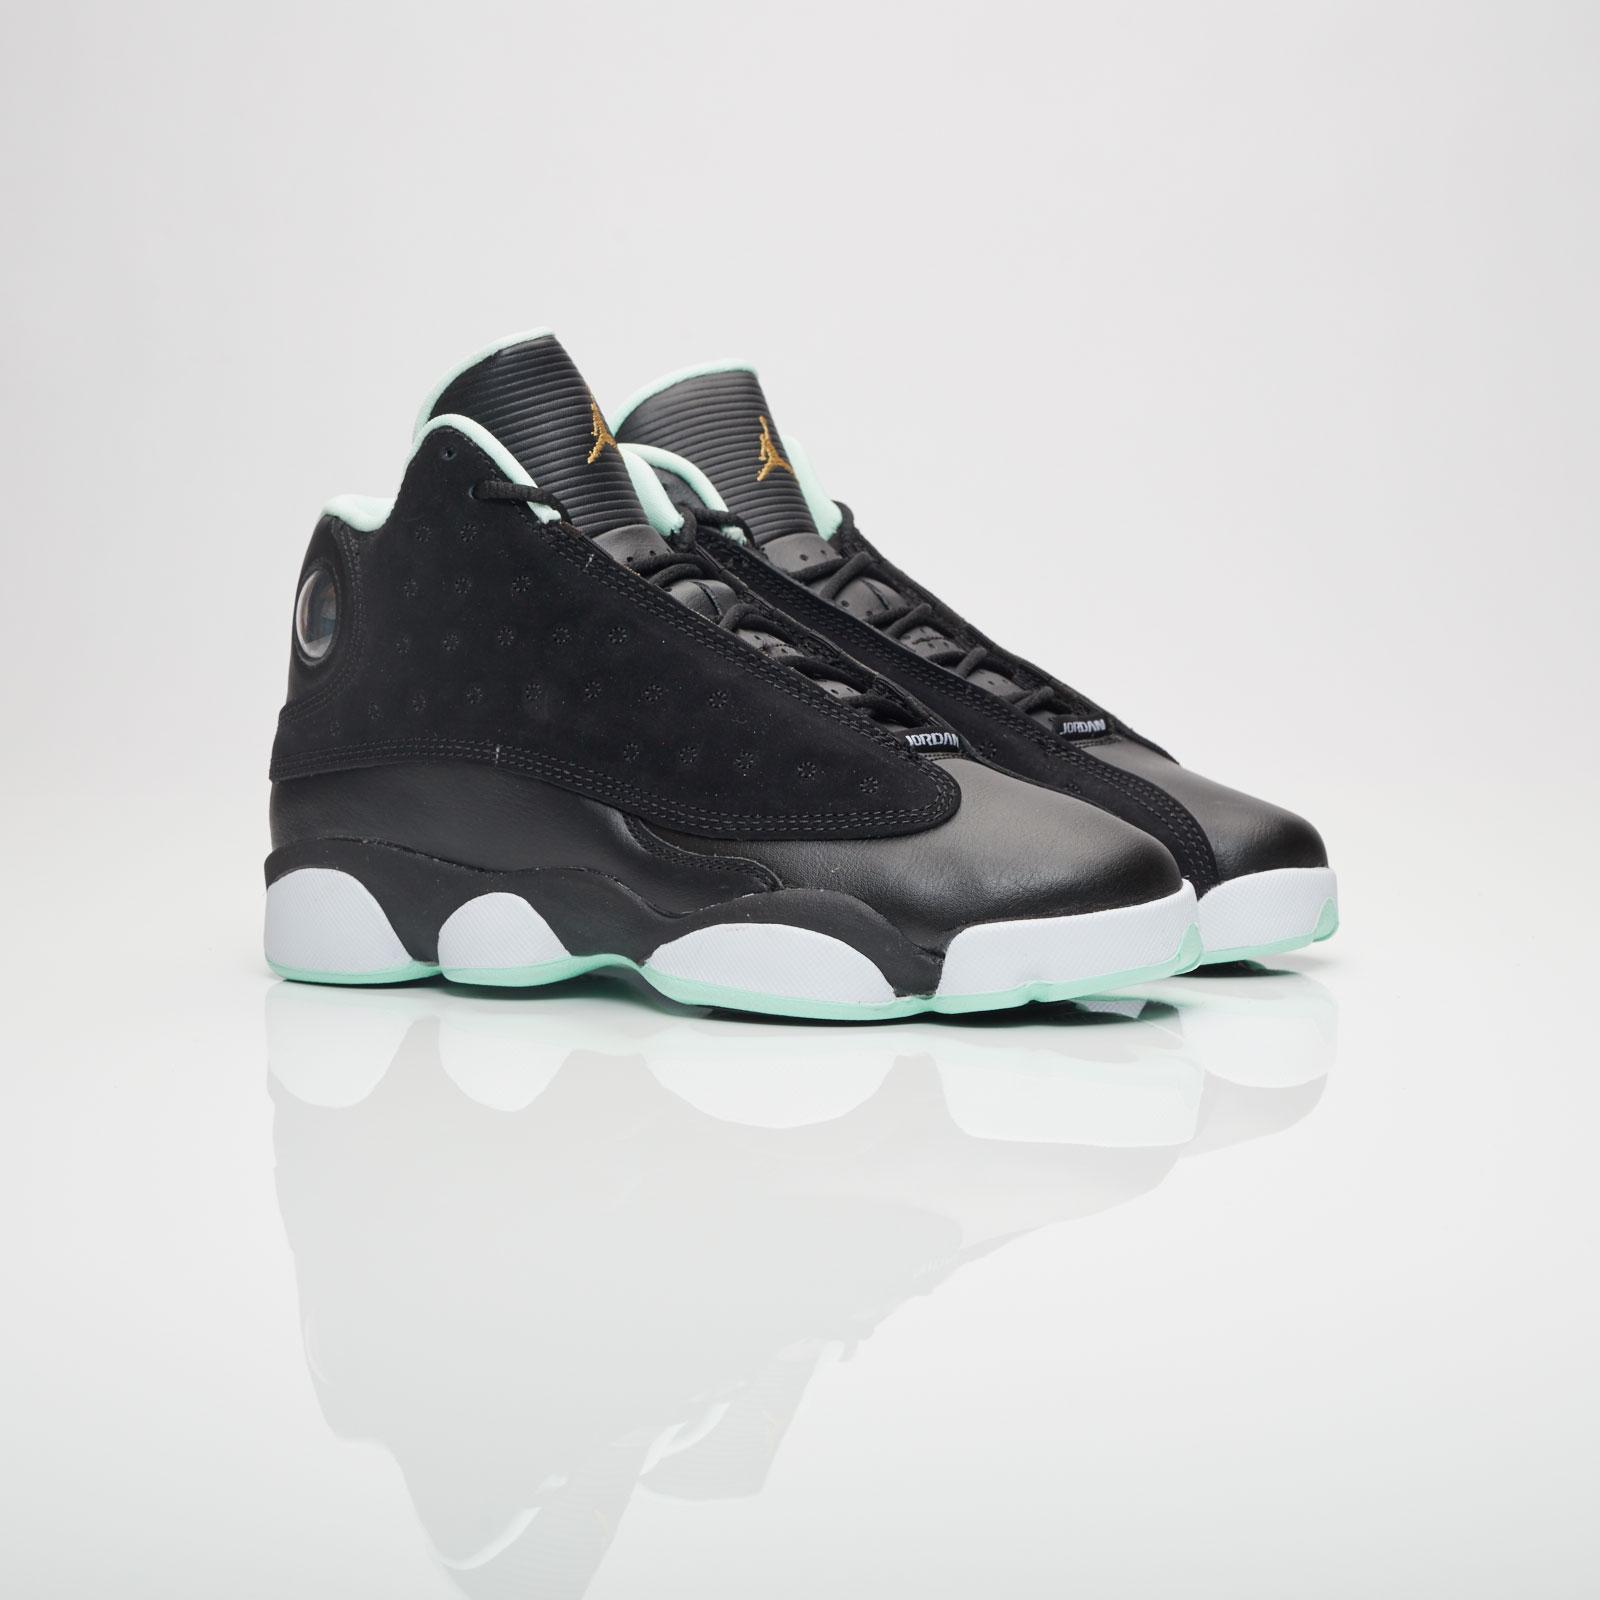 784cf457d56 Jordan Brand Air Jordan 13 Retro (GS) - 439358-015 - Sneakersnstuff ...